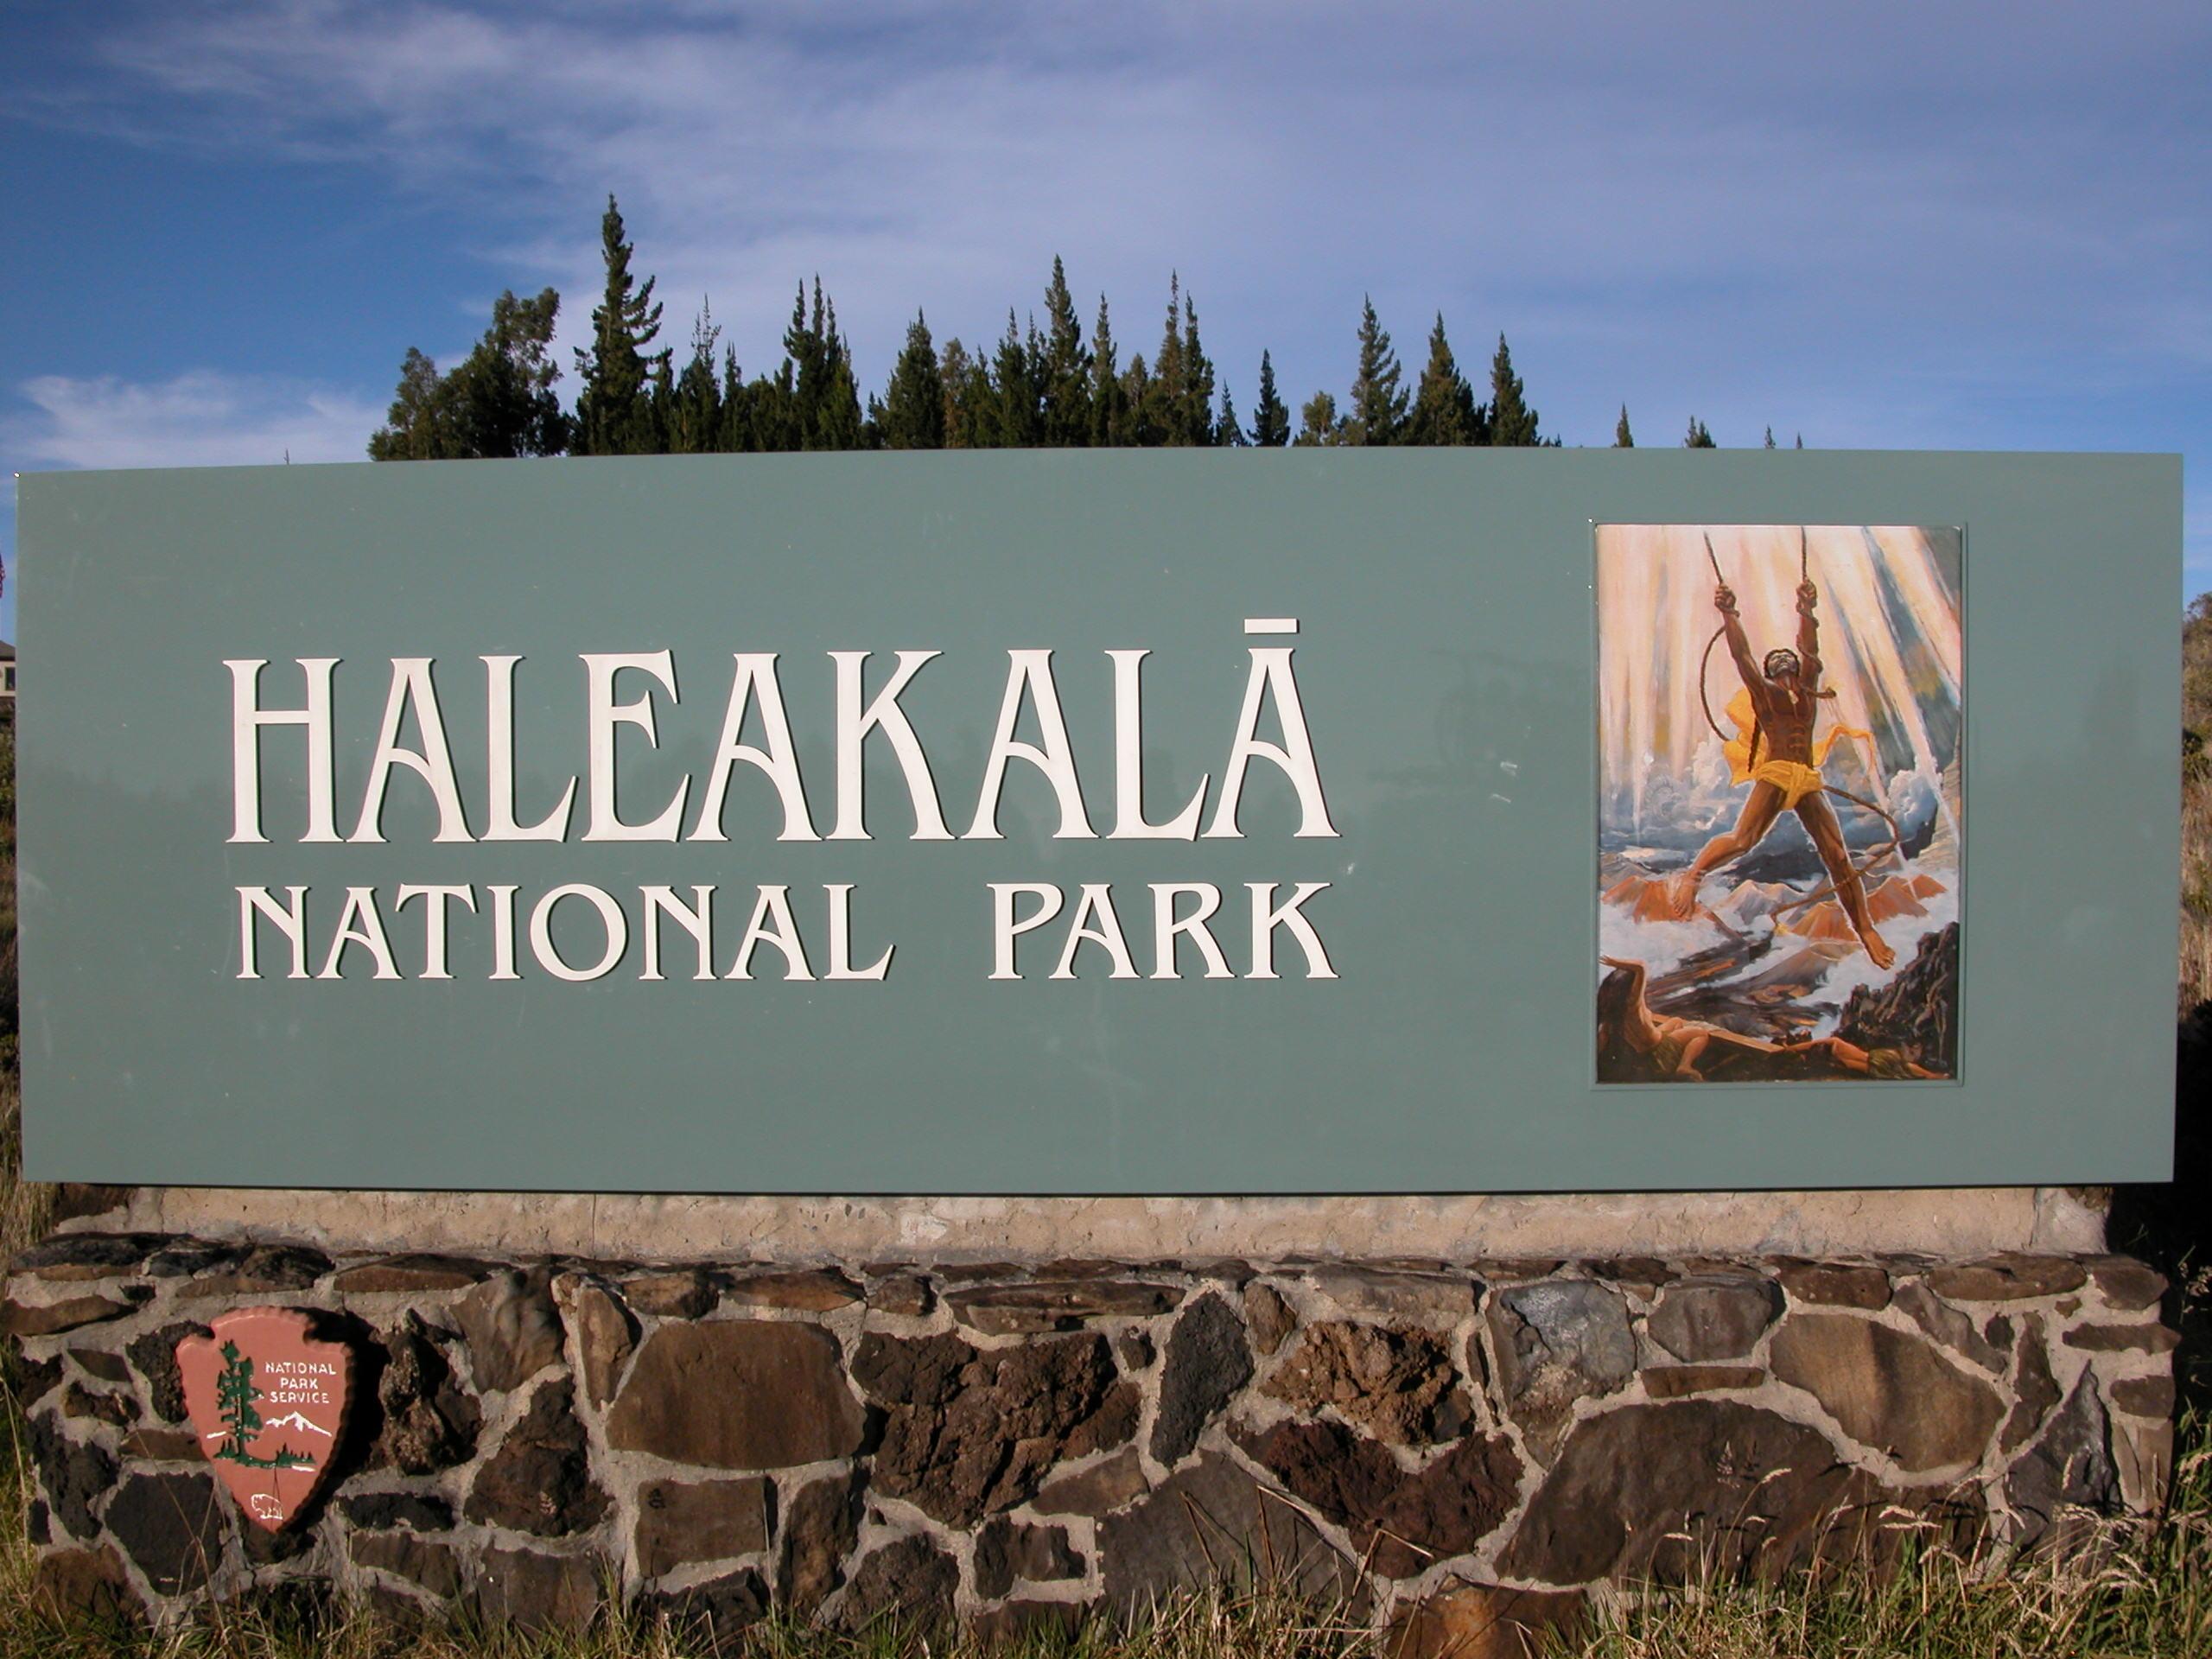 Highlights of Haleakala National Park